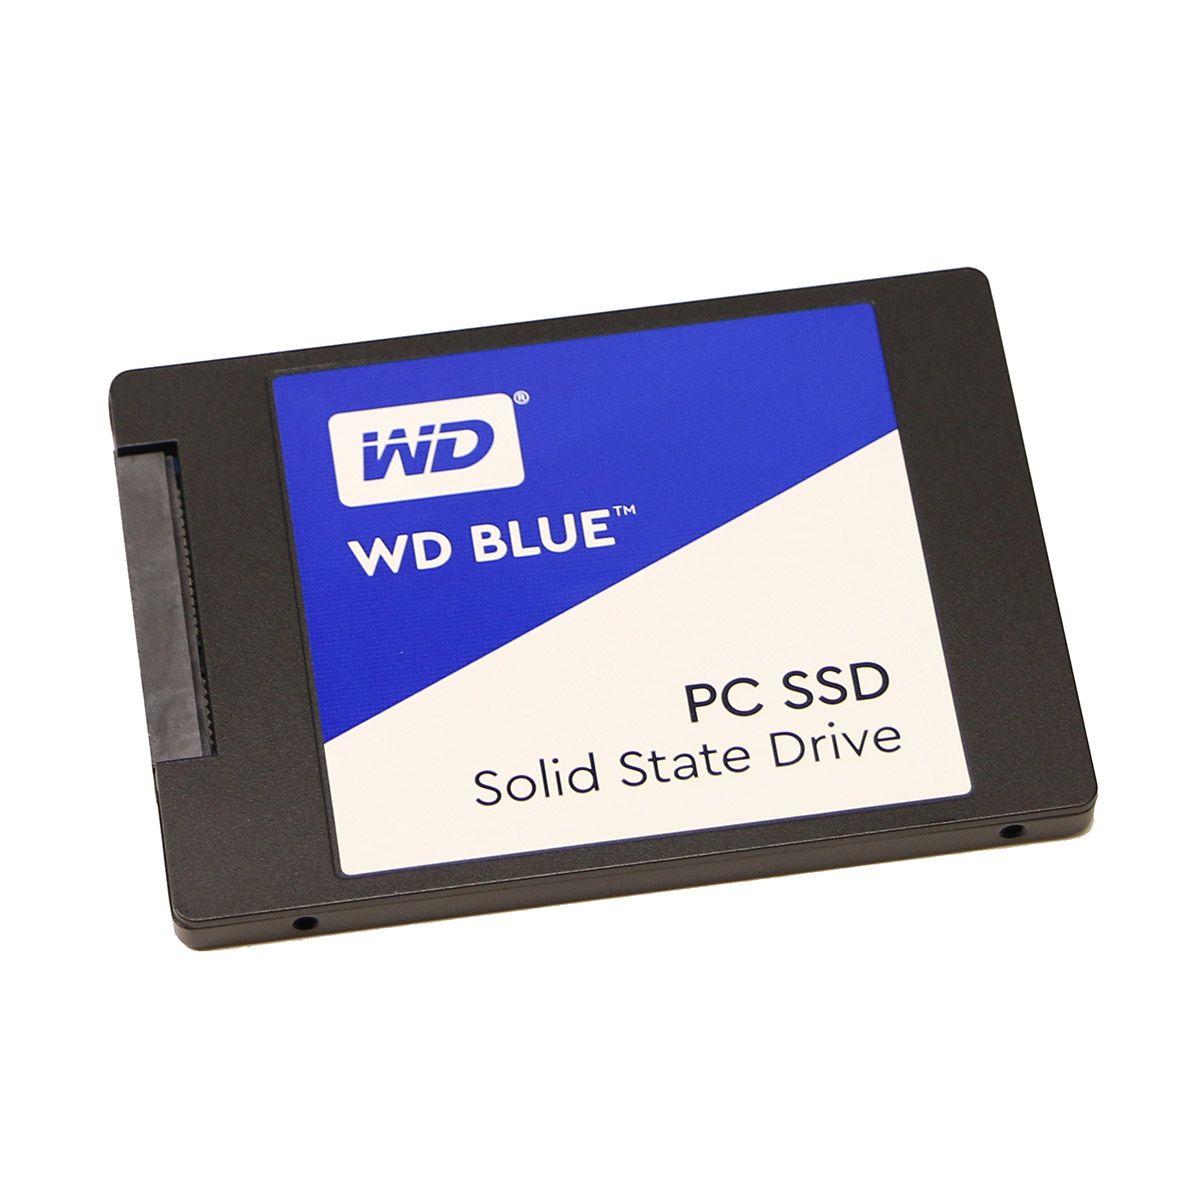 HDD SSD WD 250GB 2.5 INCH SATA3 SSD WD BLUE ,SSD HDD